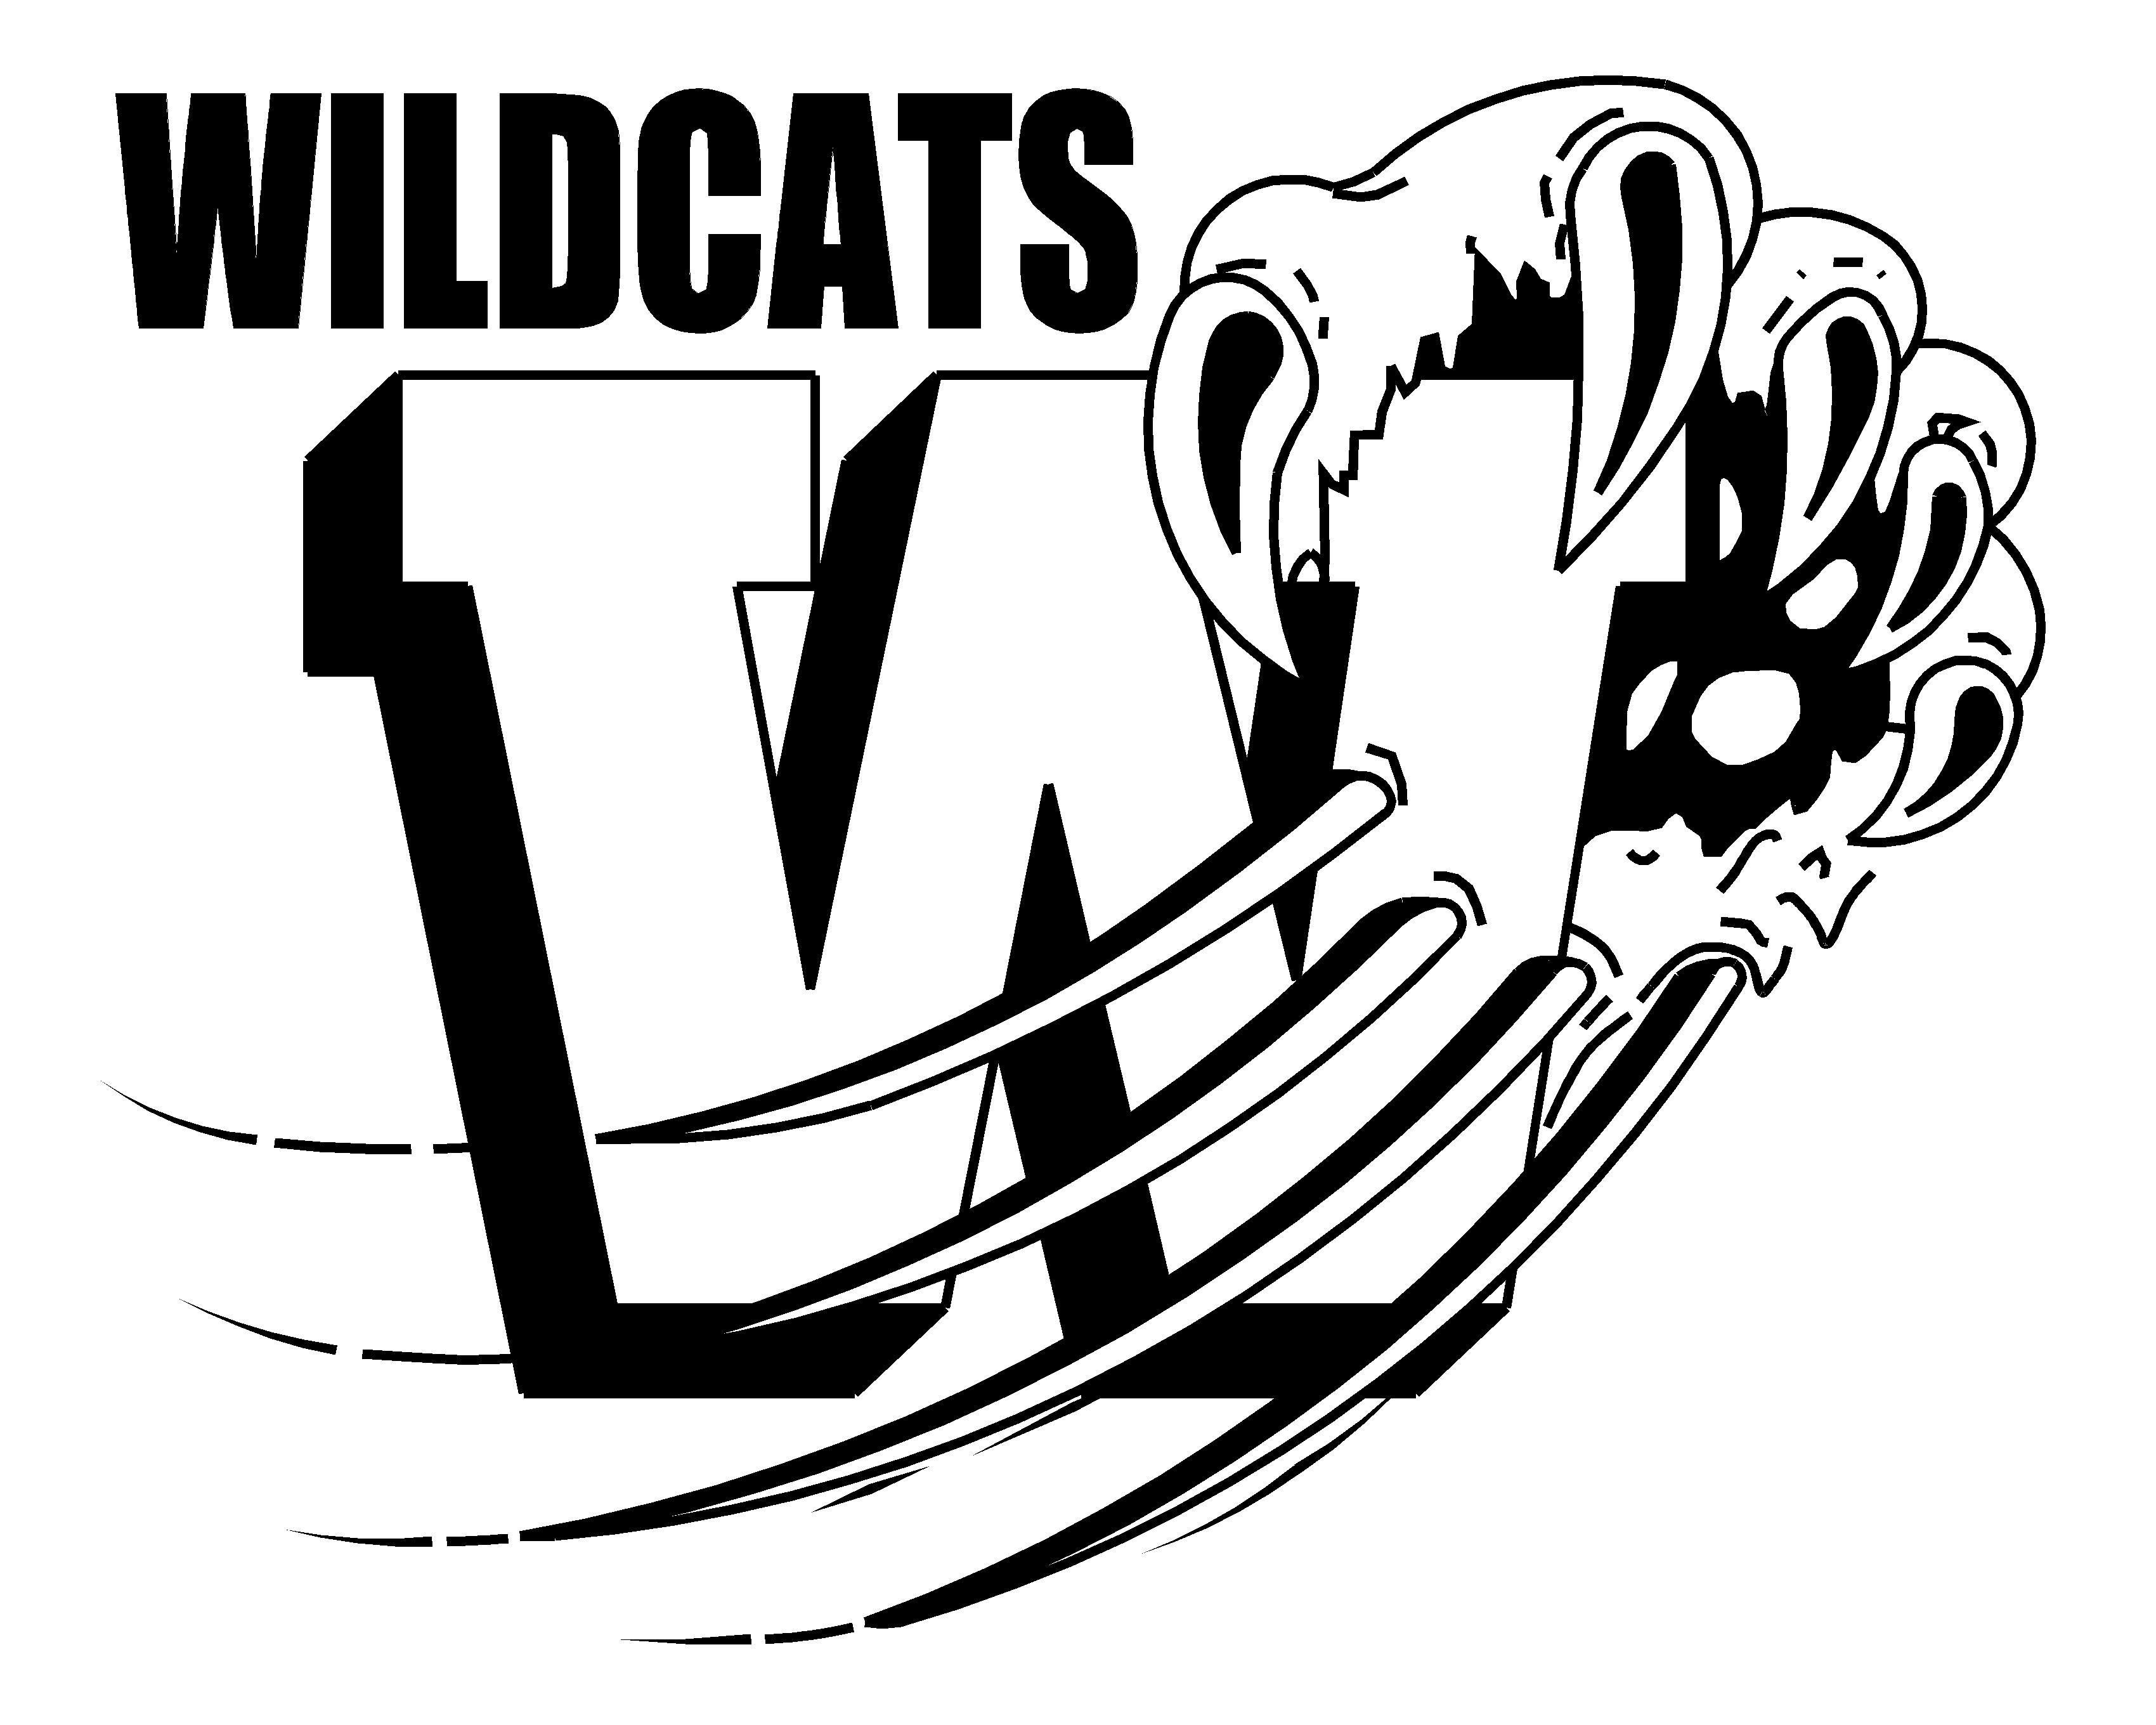 wildcats 11303865480 jpeg 3 400 2 720 pixels clipart pinterest rh pinterest com uk wildcats clipart wildcat clipart free download